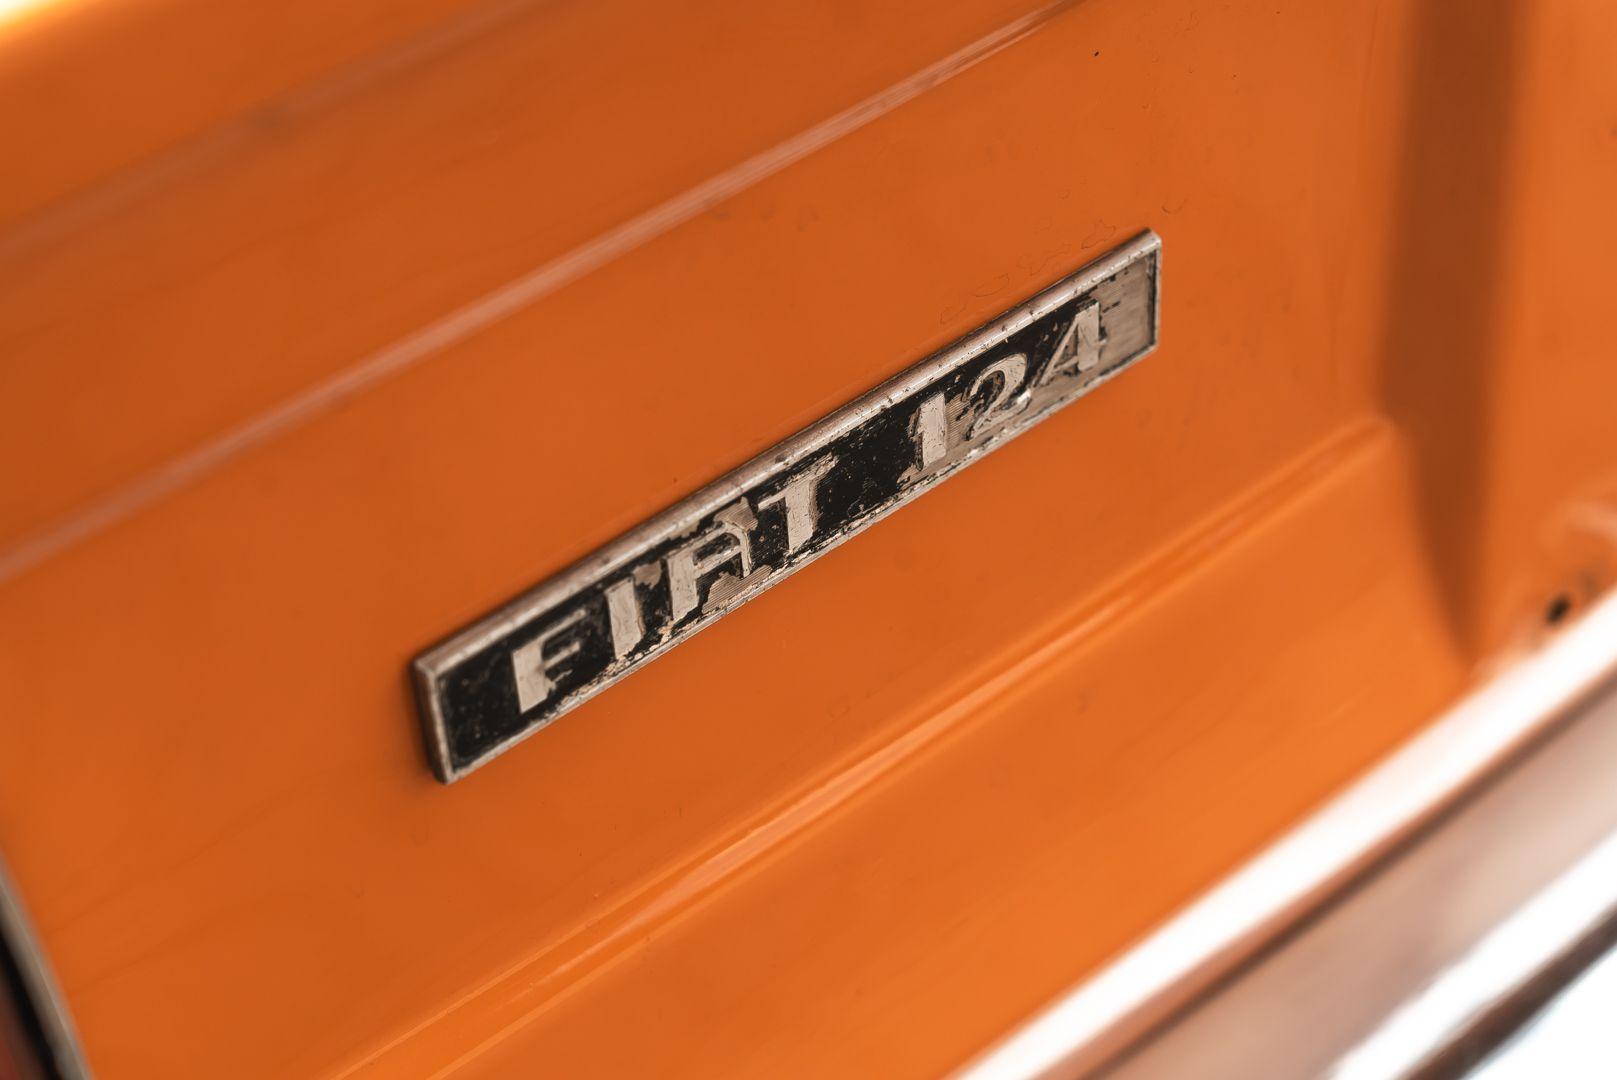 1969 Fiat 124 Coupé Eveline Vignale 81752